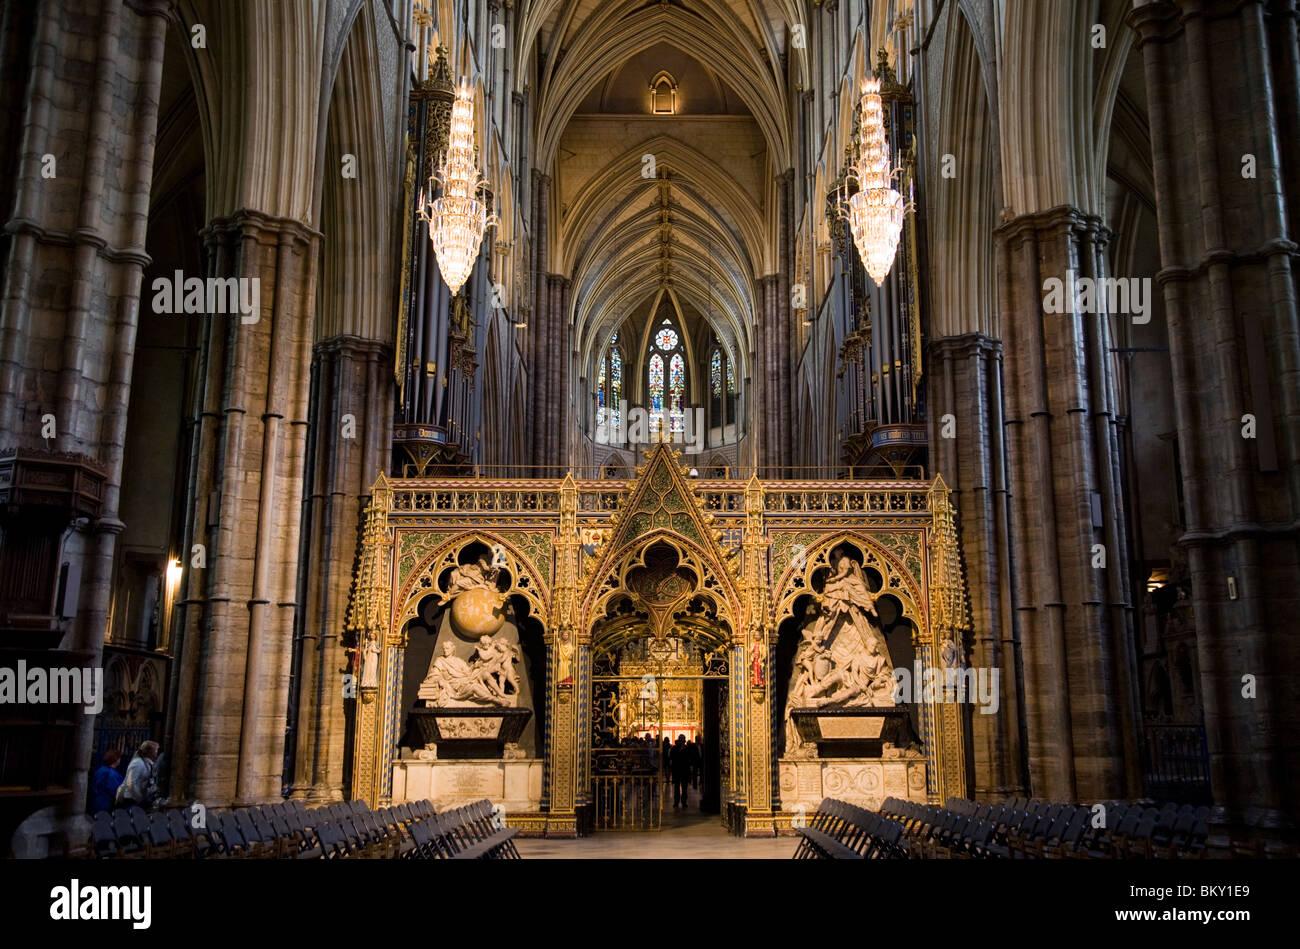 Organ Gallery Coro Biombo Y Quire Choir Screen Isaac